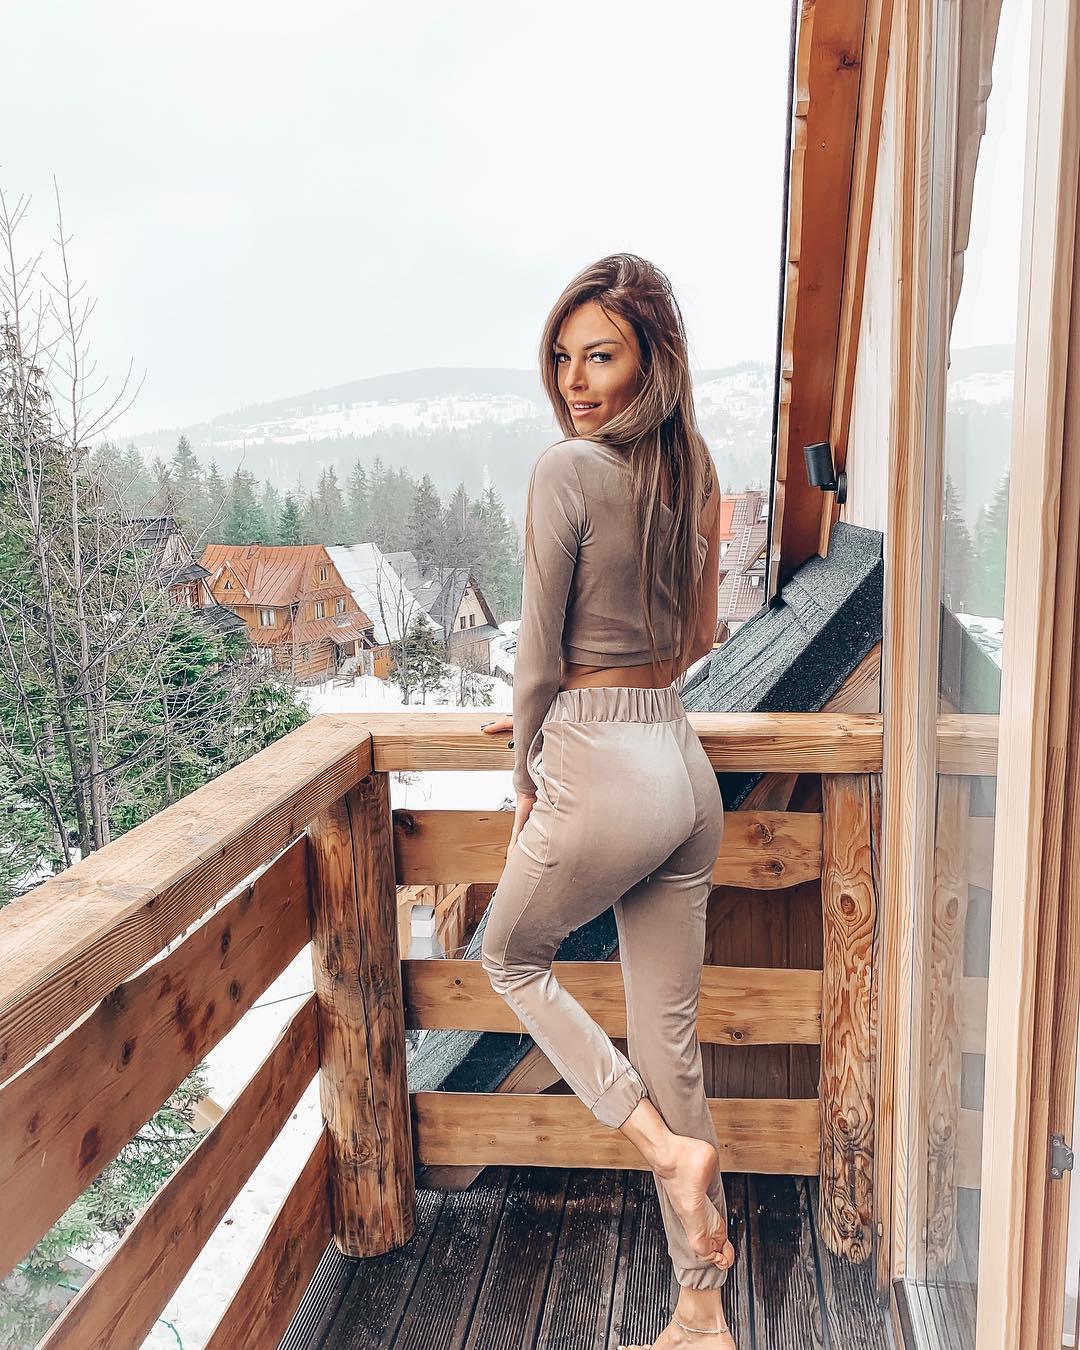 Karolina-Karolczak-Wallpapers-Insta-Fit-Bio-4